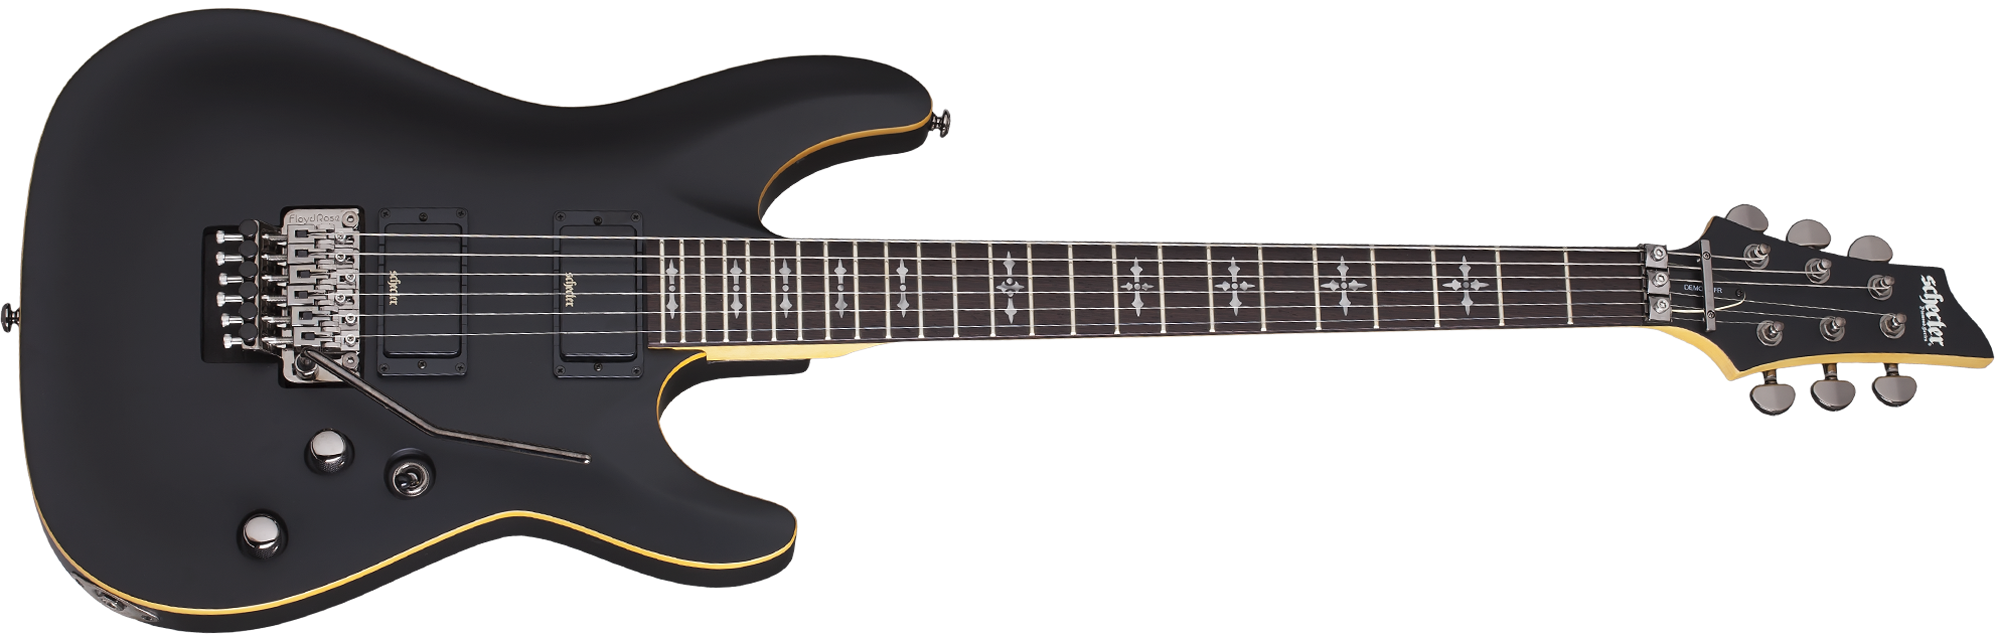 Demon-6 FR Aged Black Satin (ABSN) SKU #3661